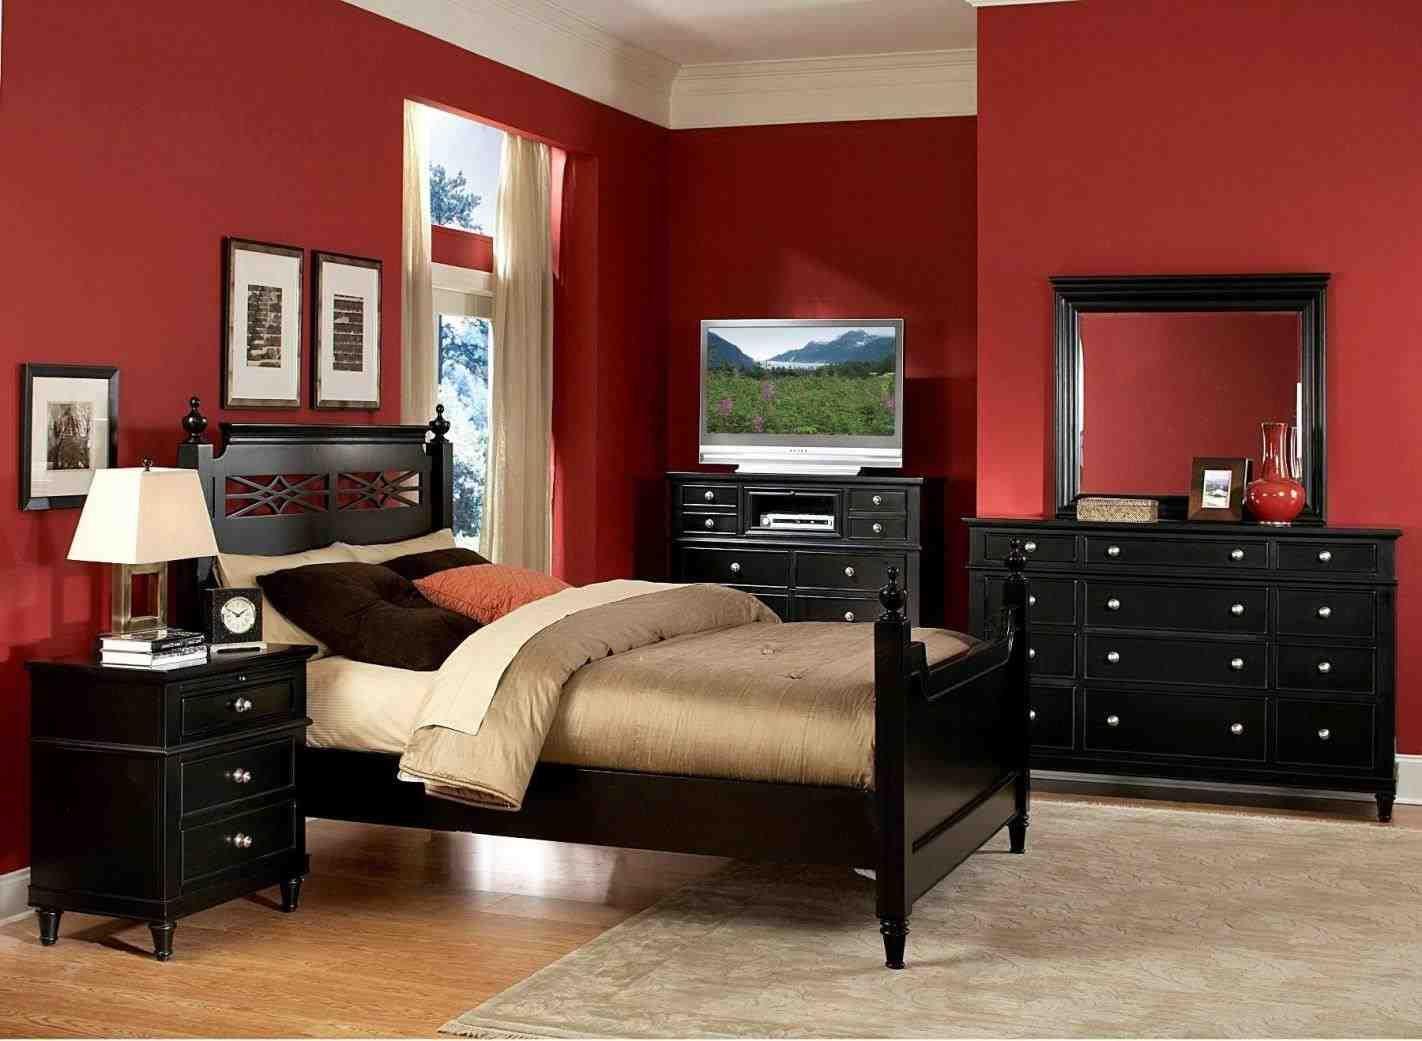 design bedroom%0A Design bedroom